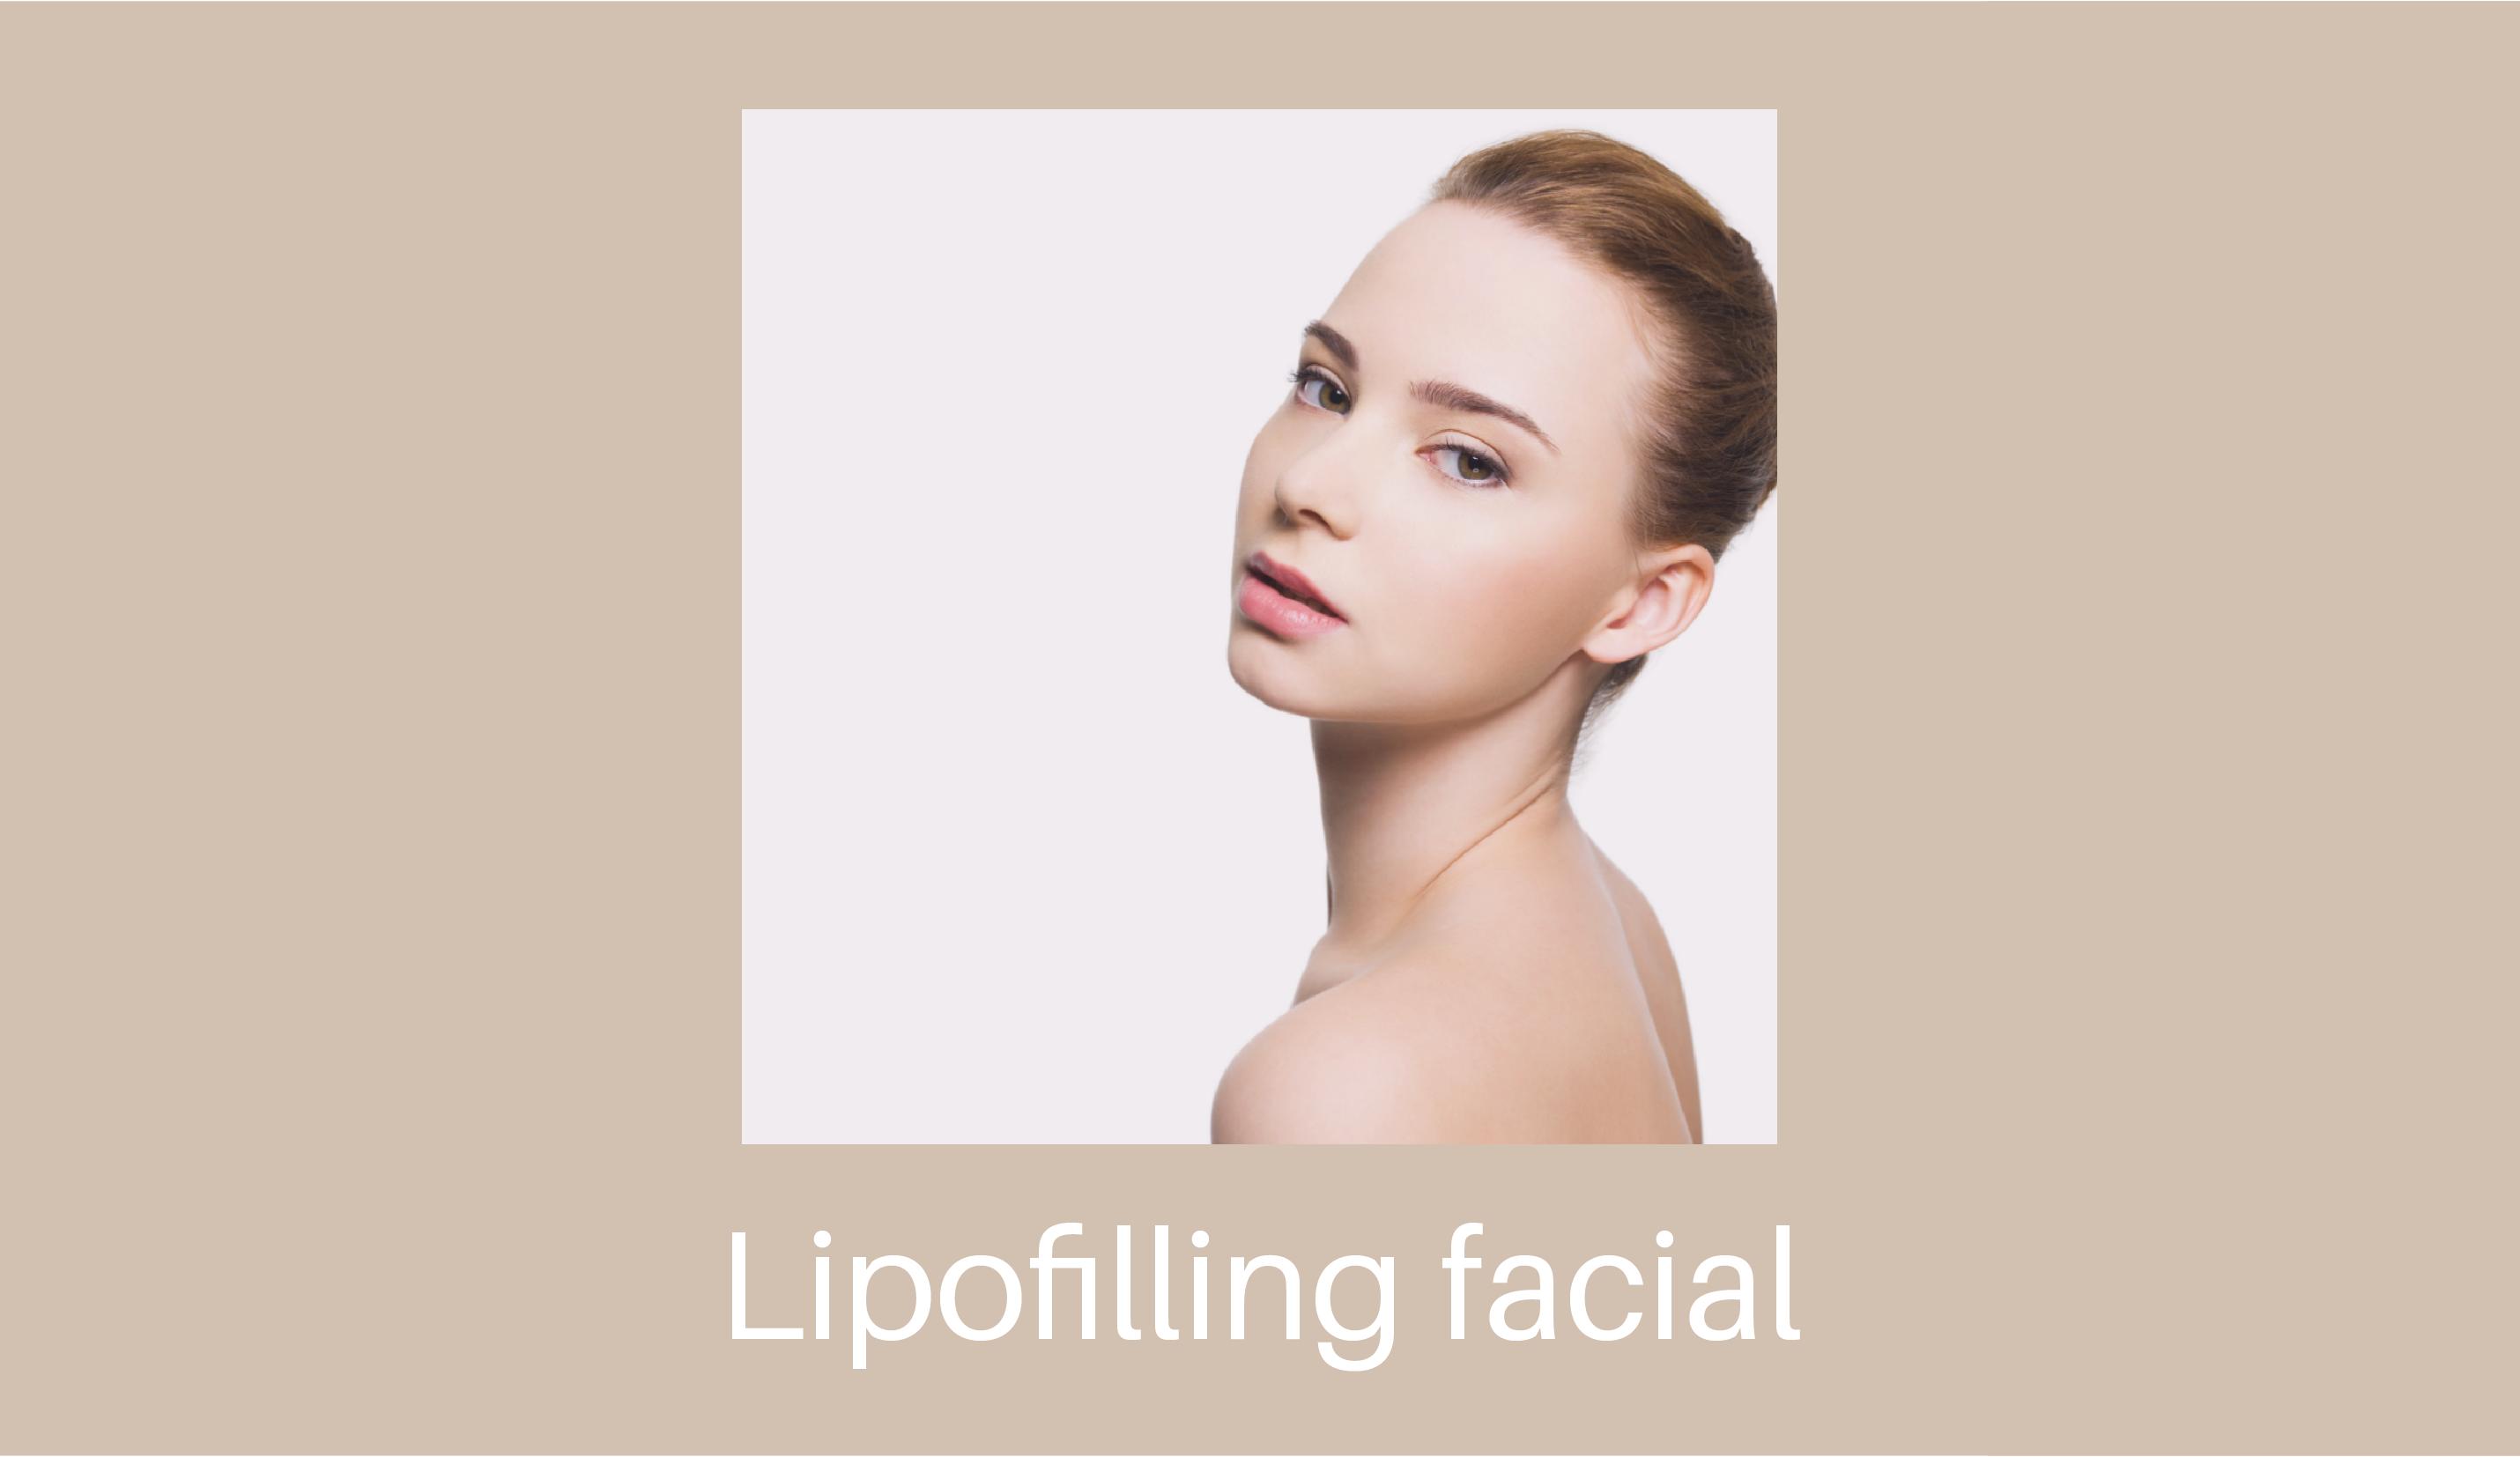 plantilla_lipofillingfacial